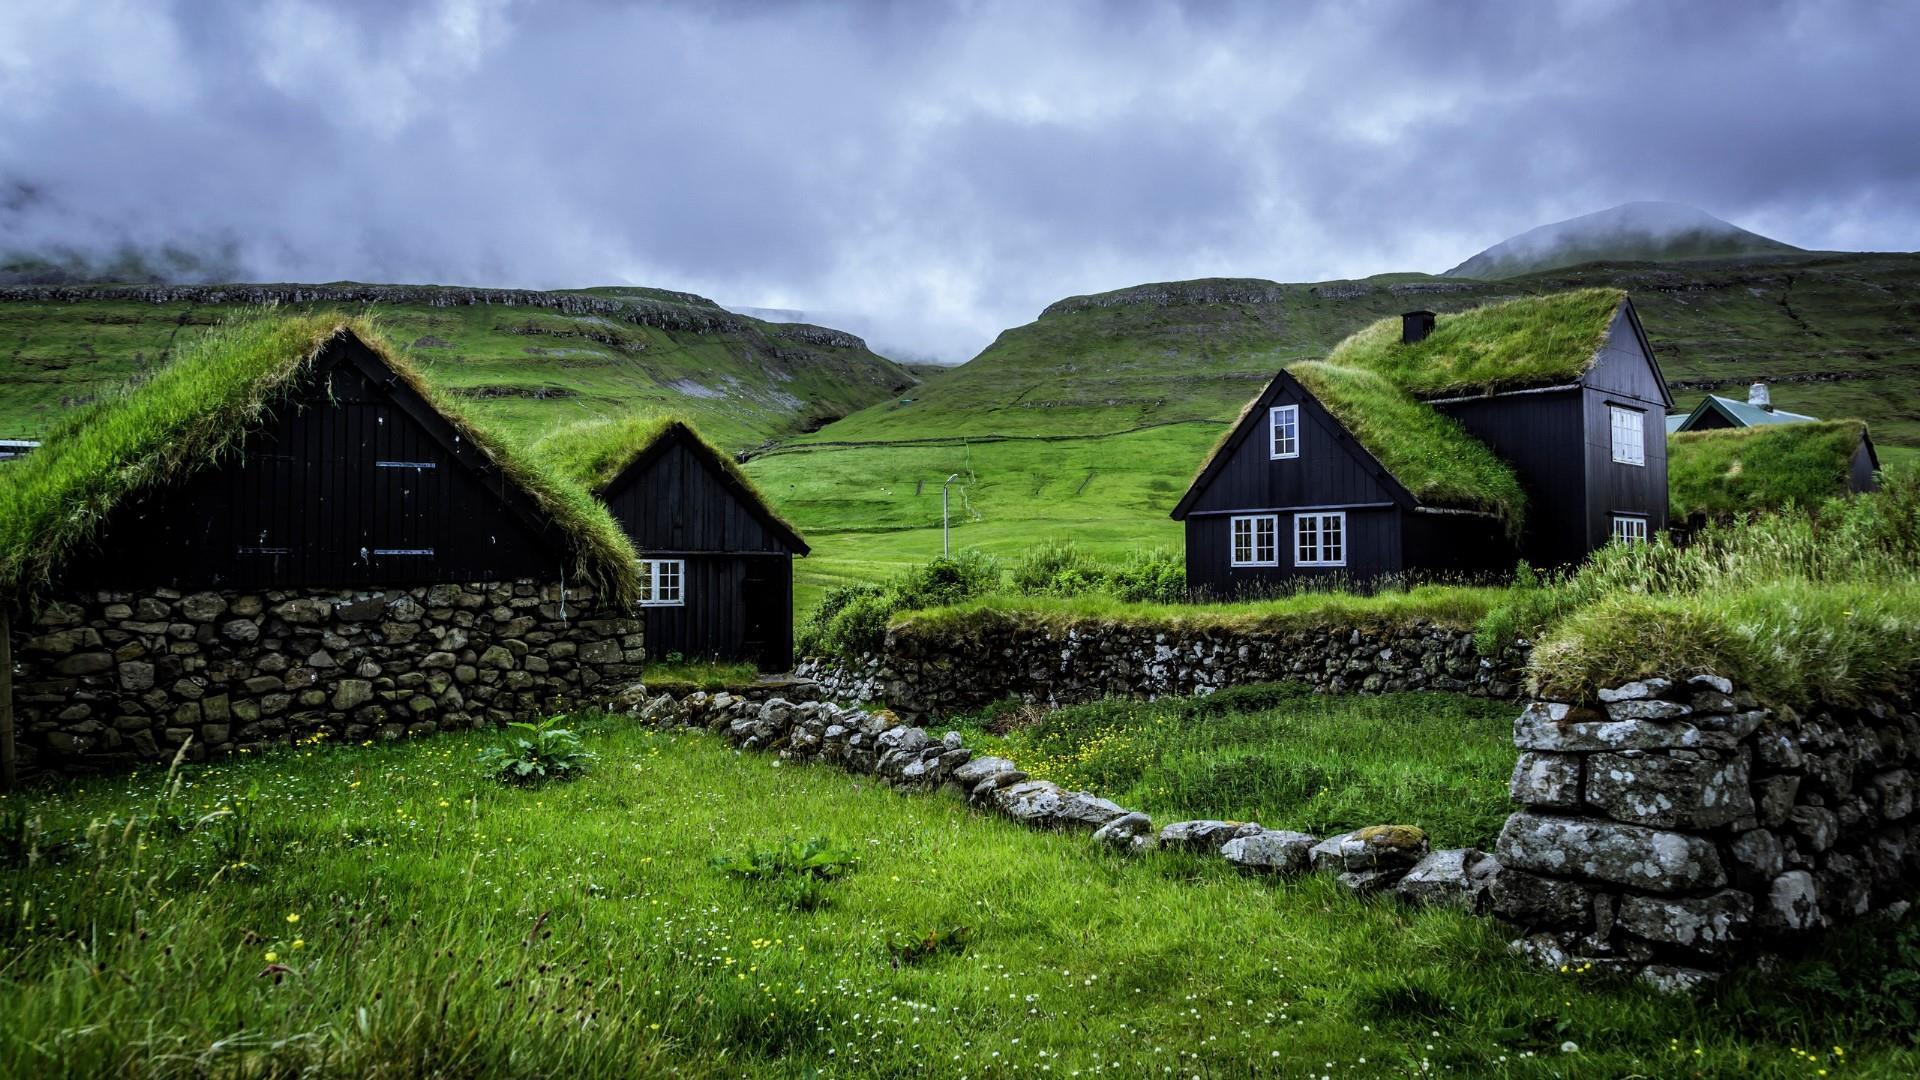 Husavik Turf Houses Faroe Islands Hd Wallpaper Backiee